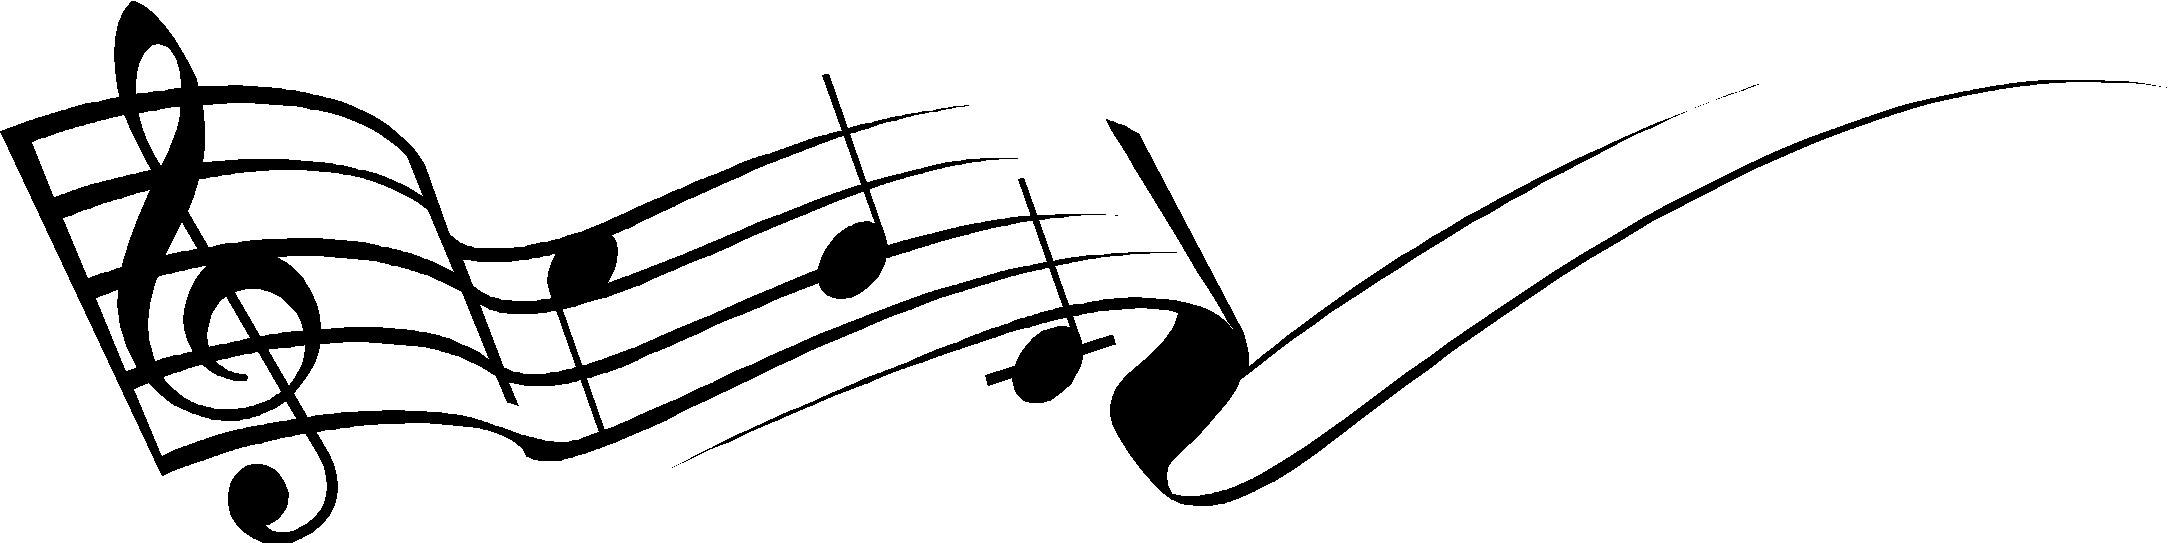 Music border musical borders music note border clipart